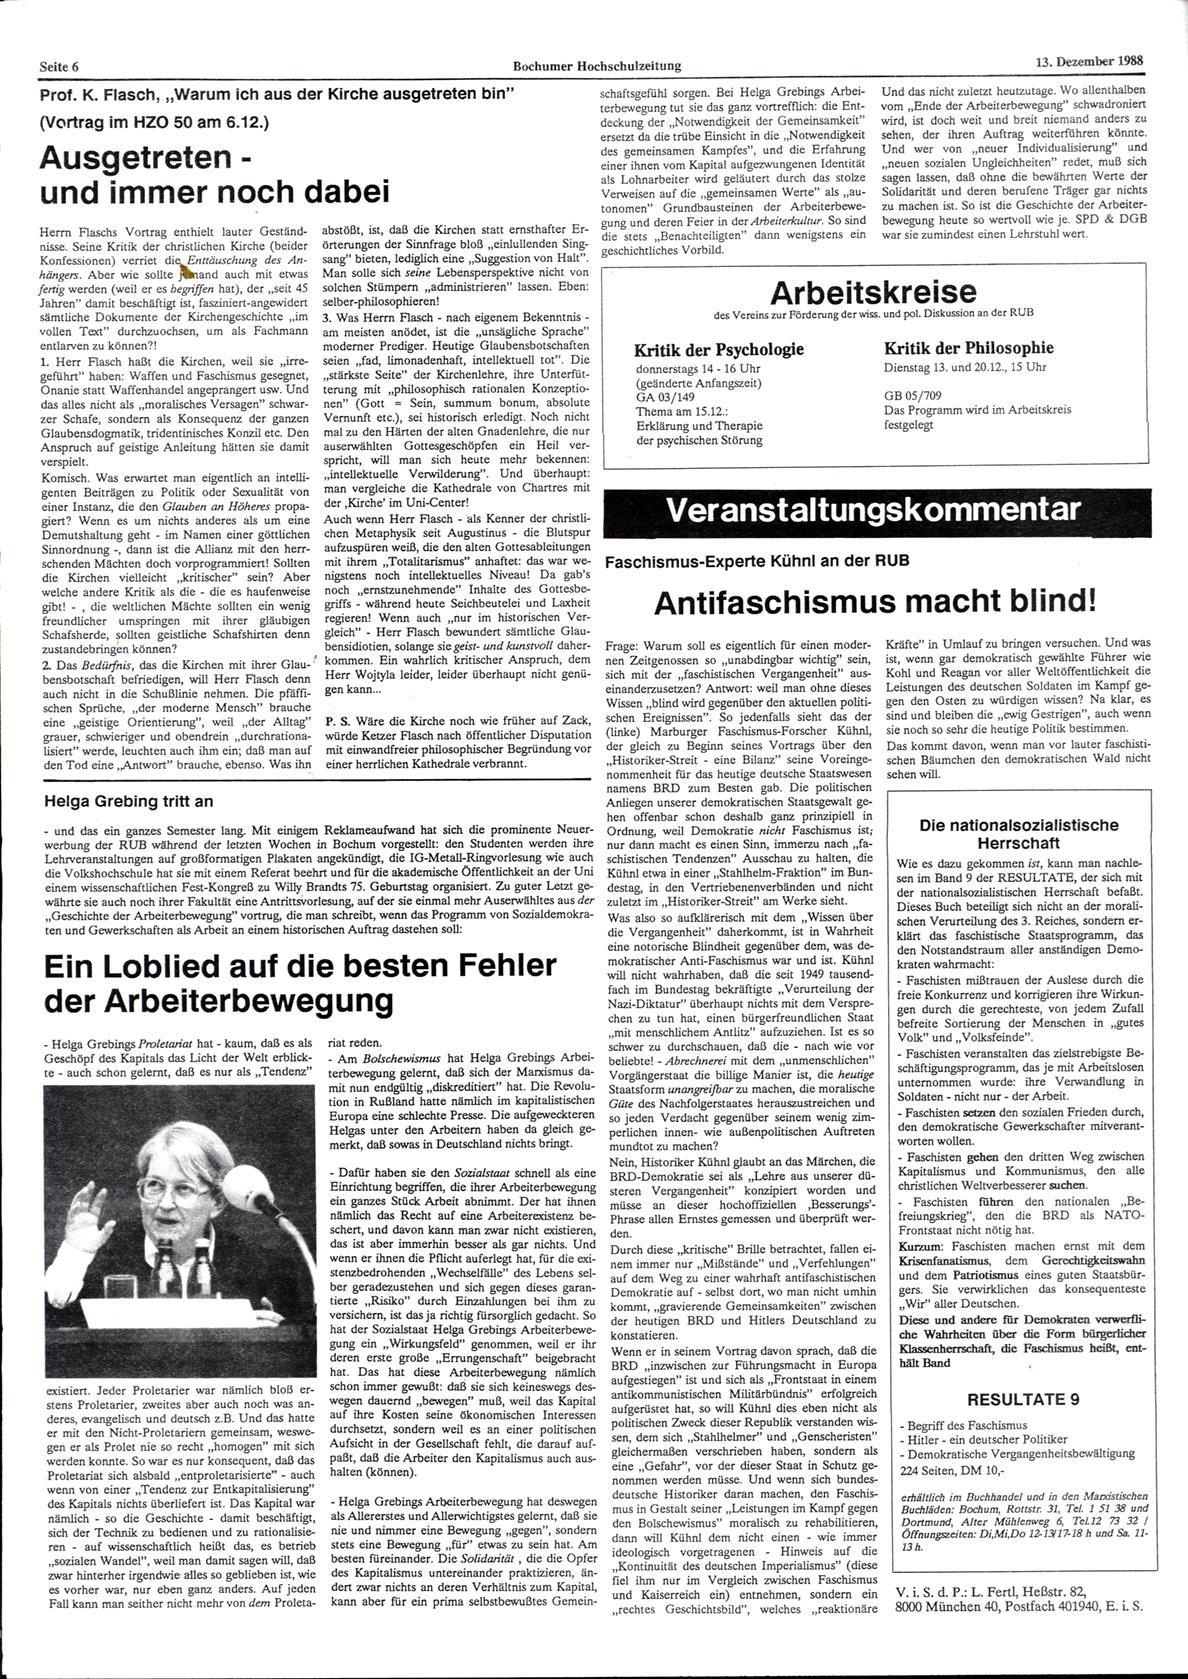 Bochum_BHZ_19881213_183_006